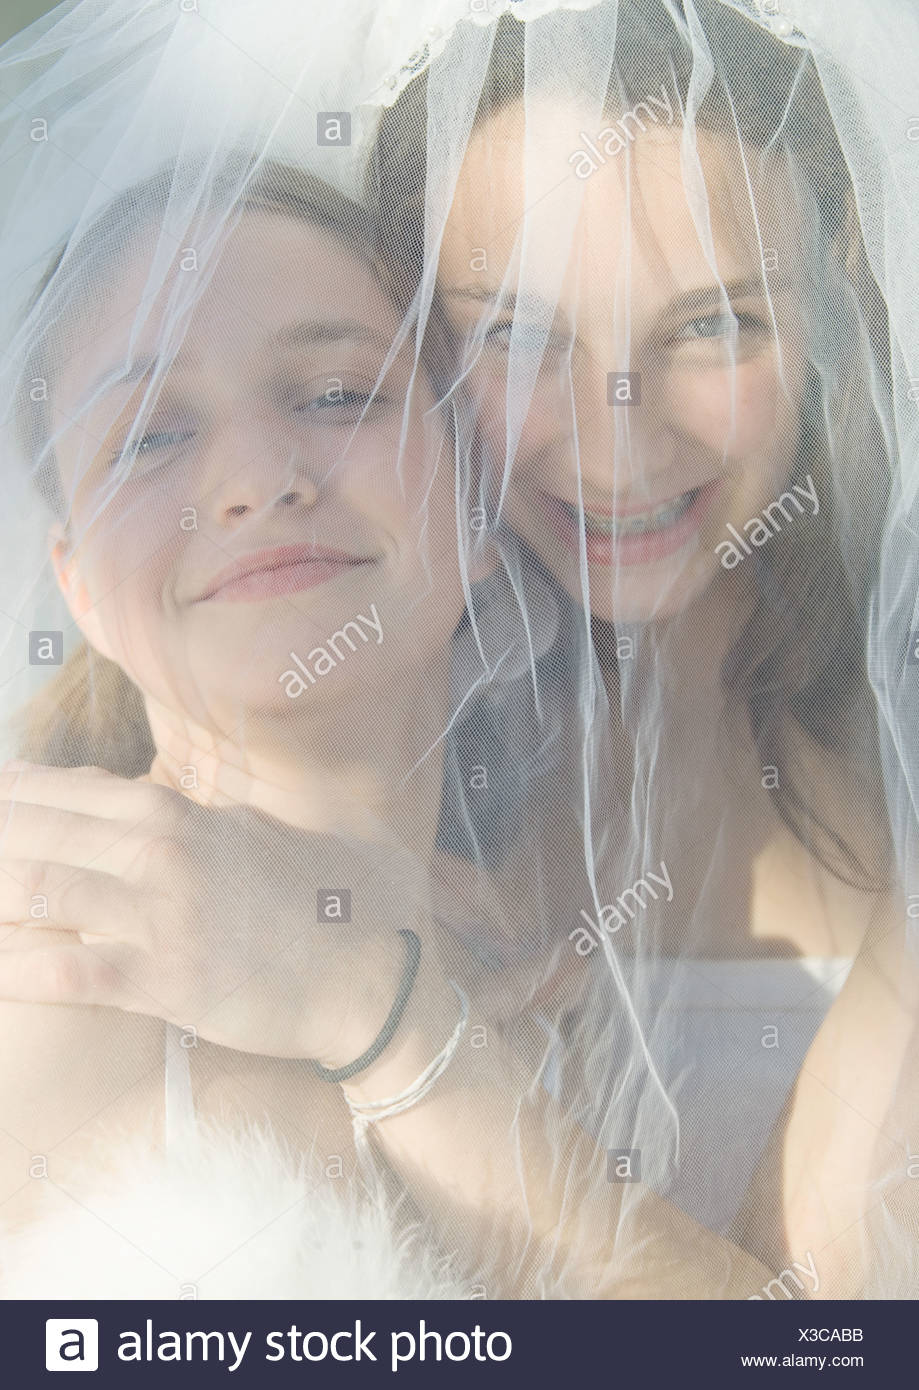 Preteen girls behind wedding veil - Stock Image